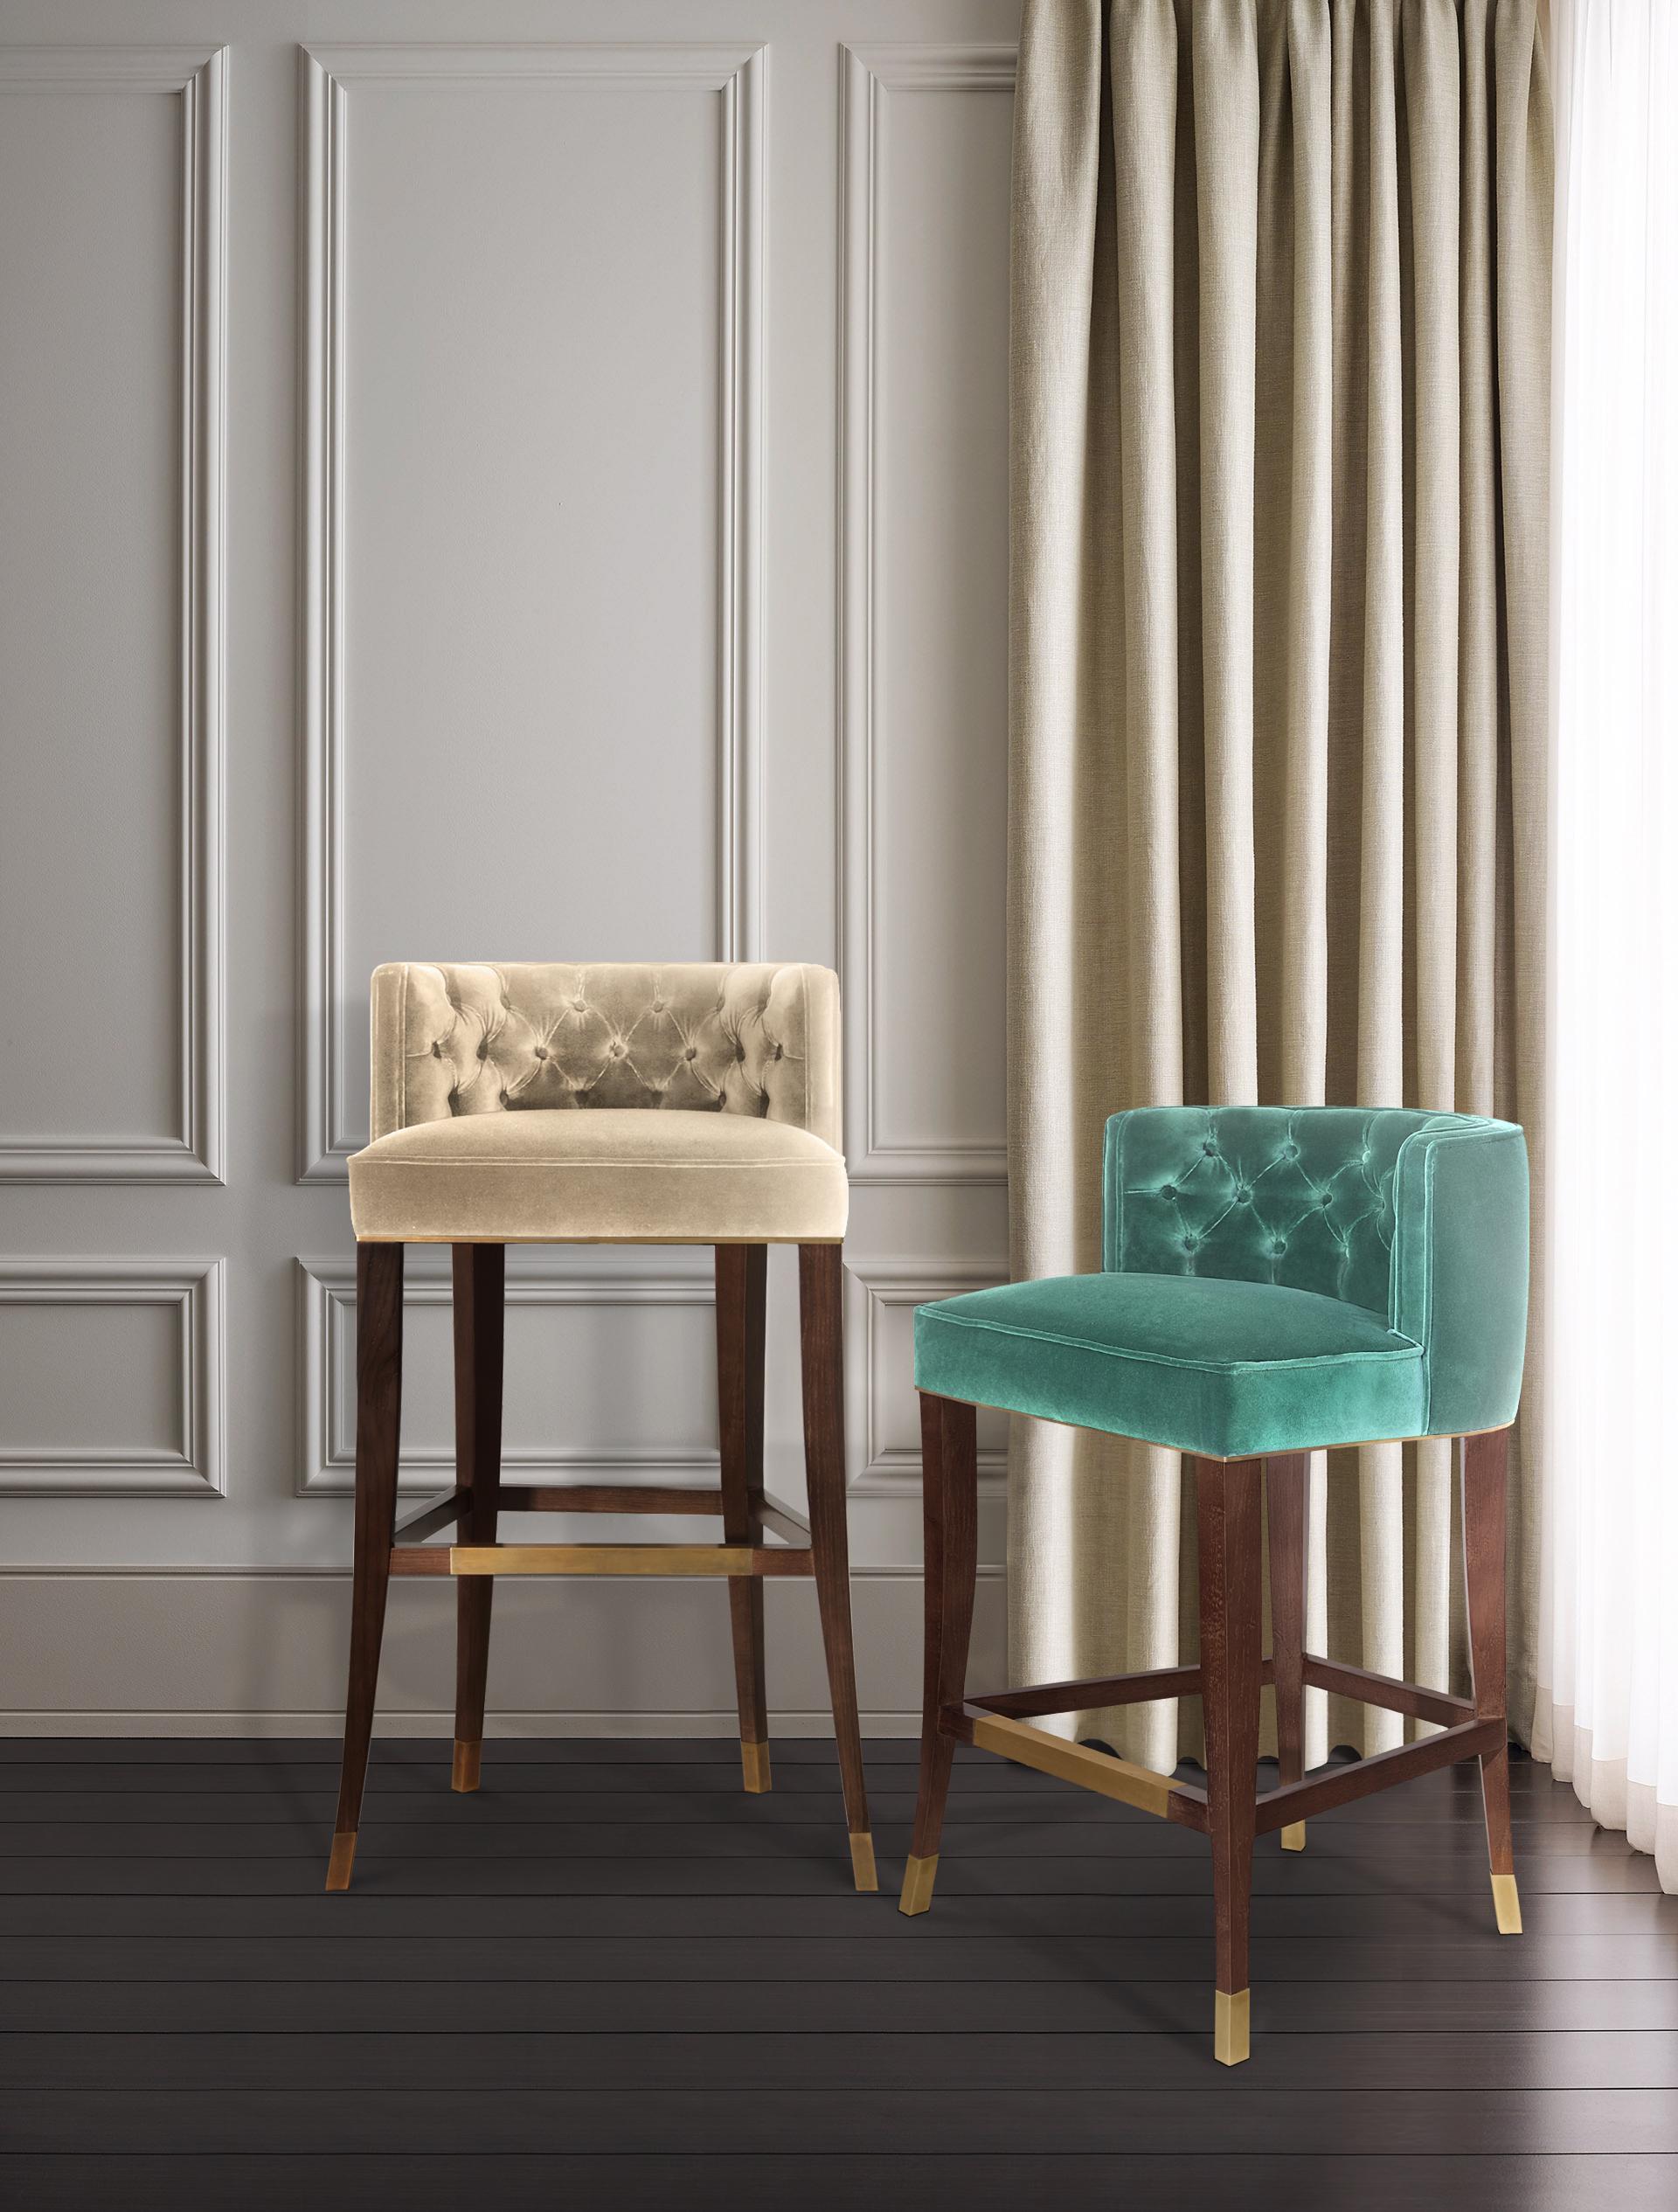 2020 interior design trends More 2020 Interior Design Trends: The Best New Ambiances More 2020 Interior Design Trends The Best New Ambiances 3